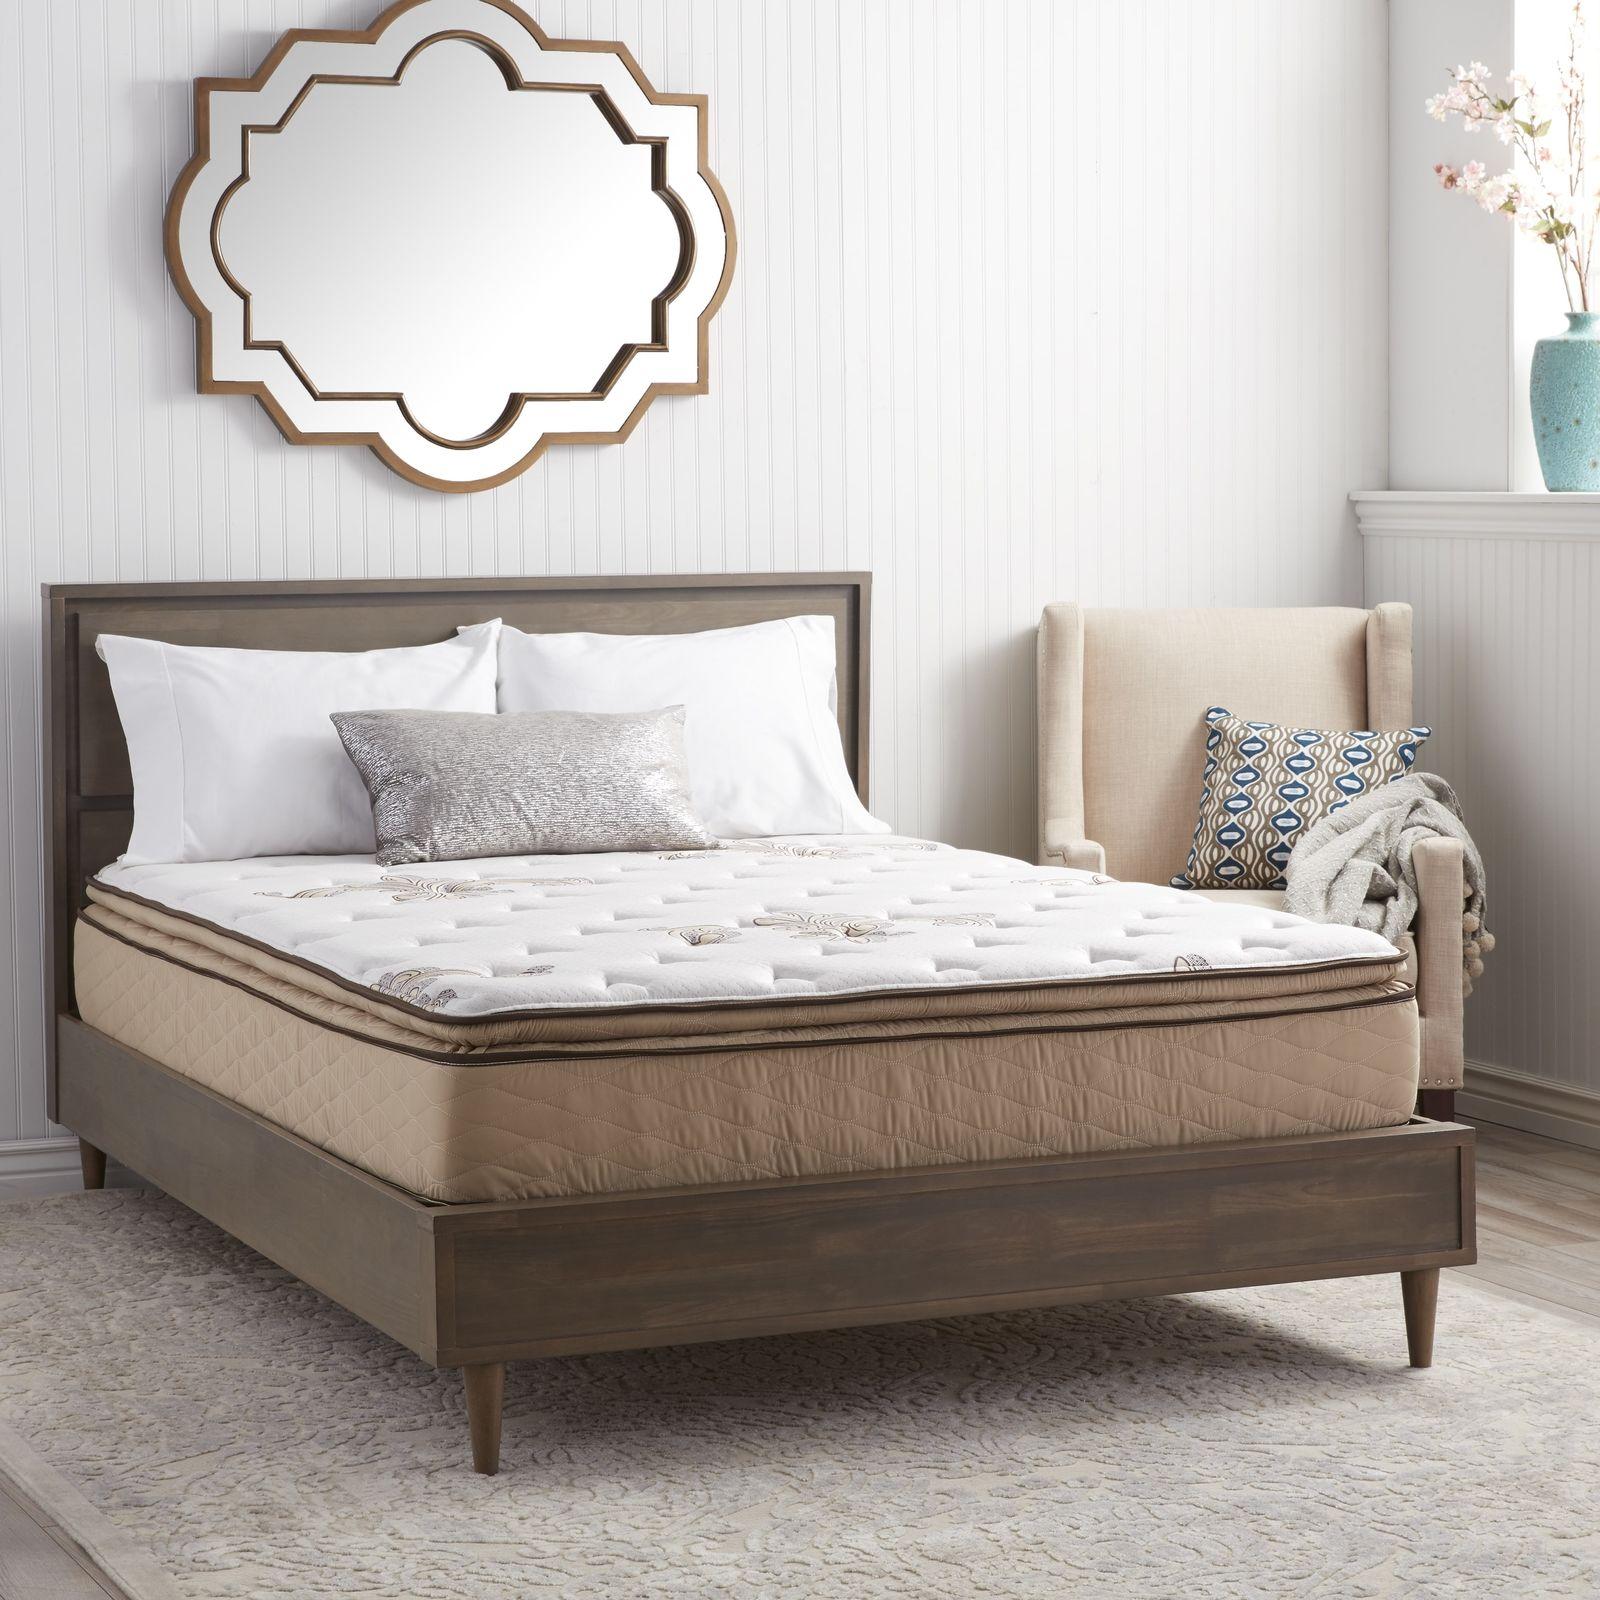 pocket spring mattress customized Bedroom Furniture bedding factory - Jozy Mattress   Jozy.net